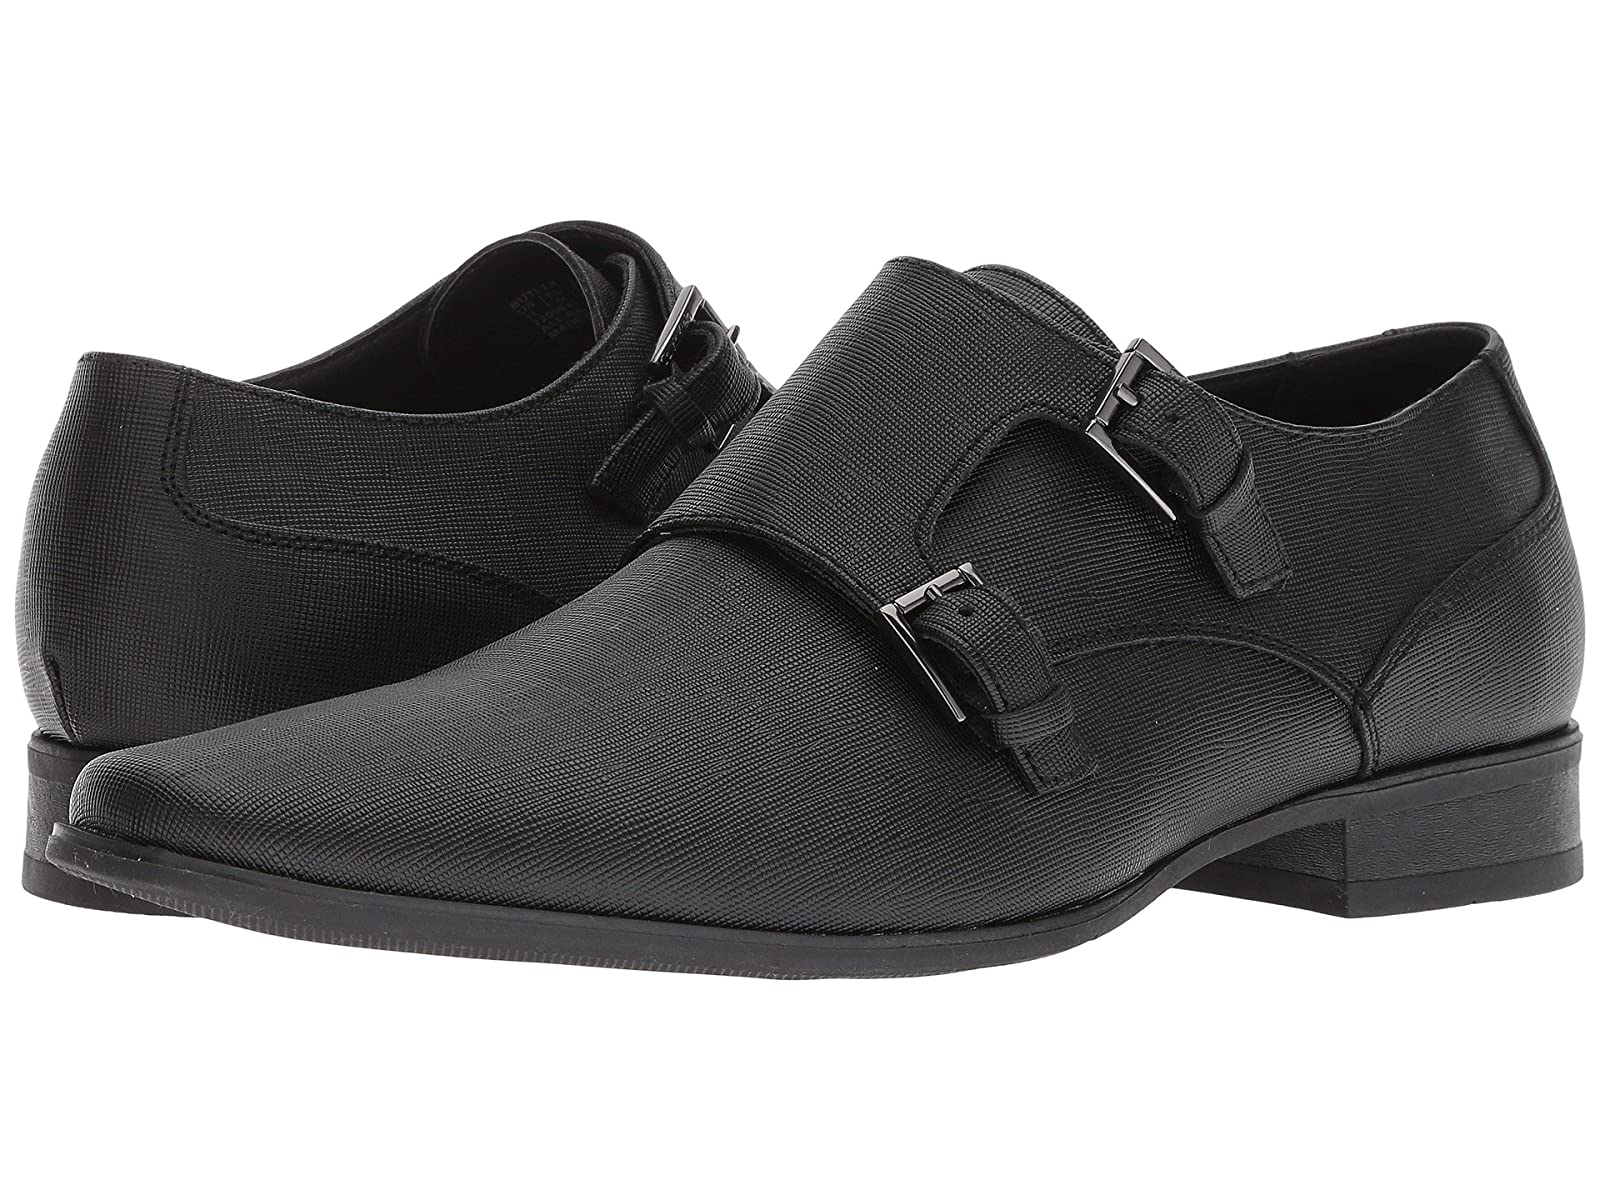 Calvin Klein ButlerCheap and distinctive eye-catching shoes